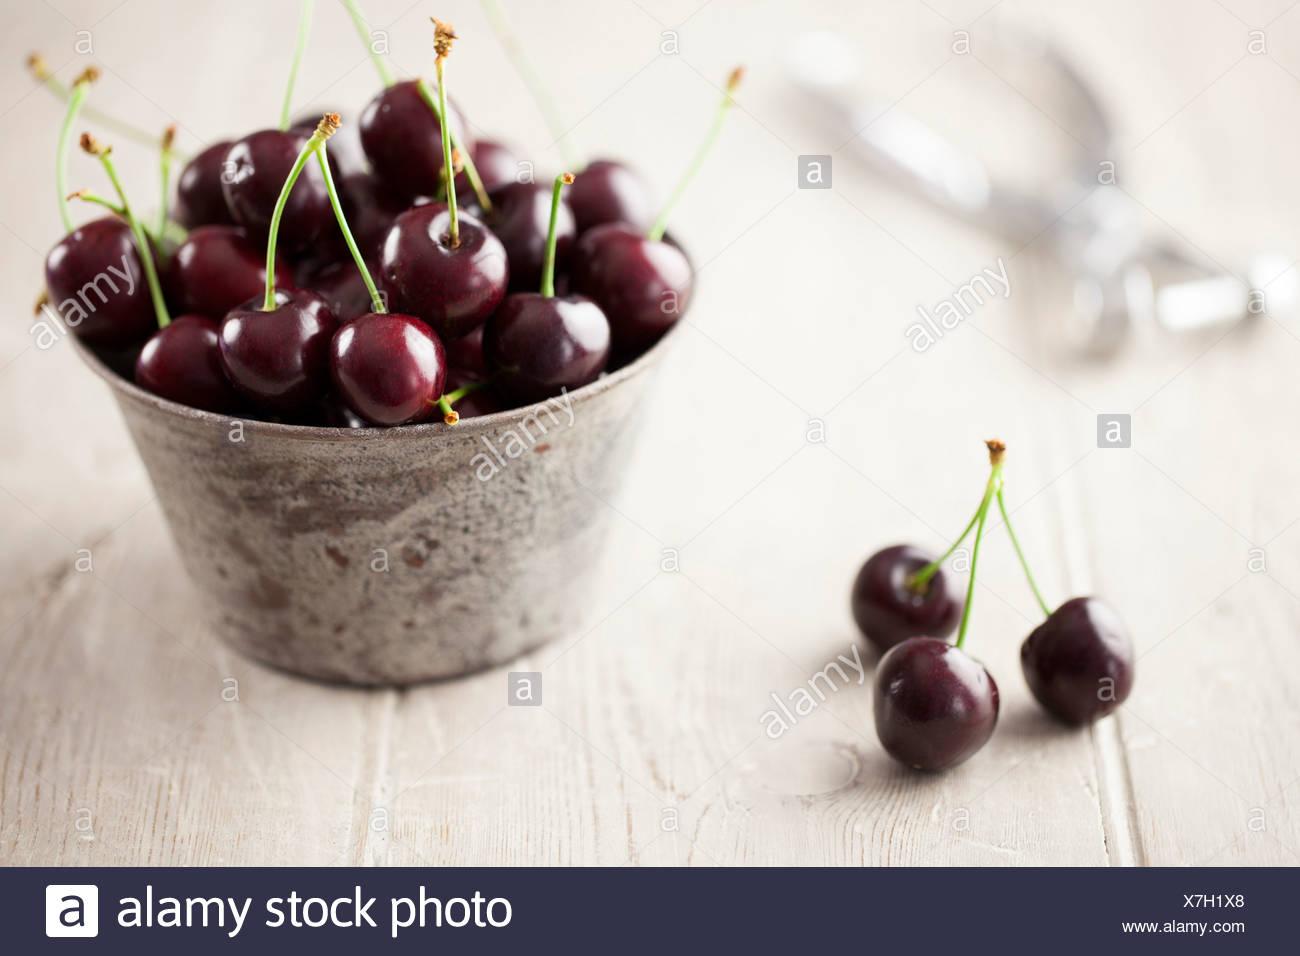 Engilsh Cherries in Metal Bowl - Stock Image